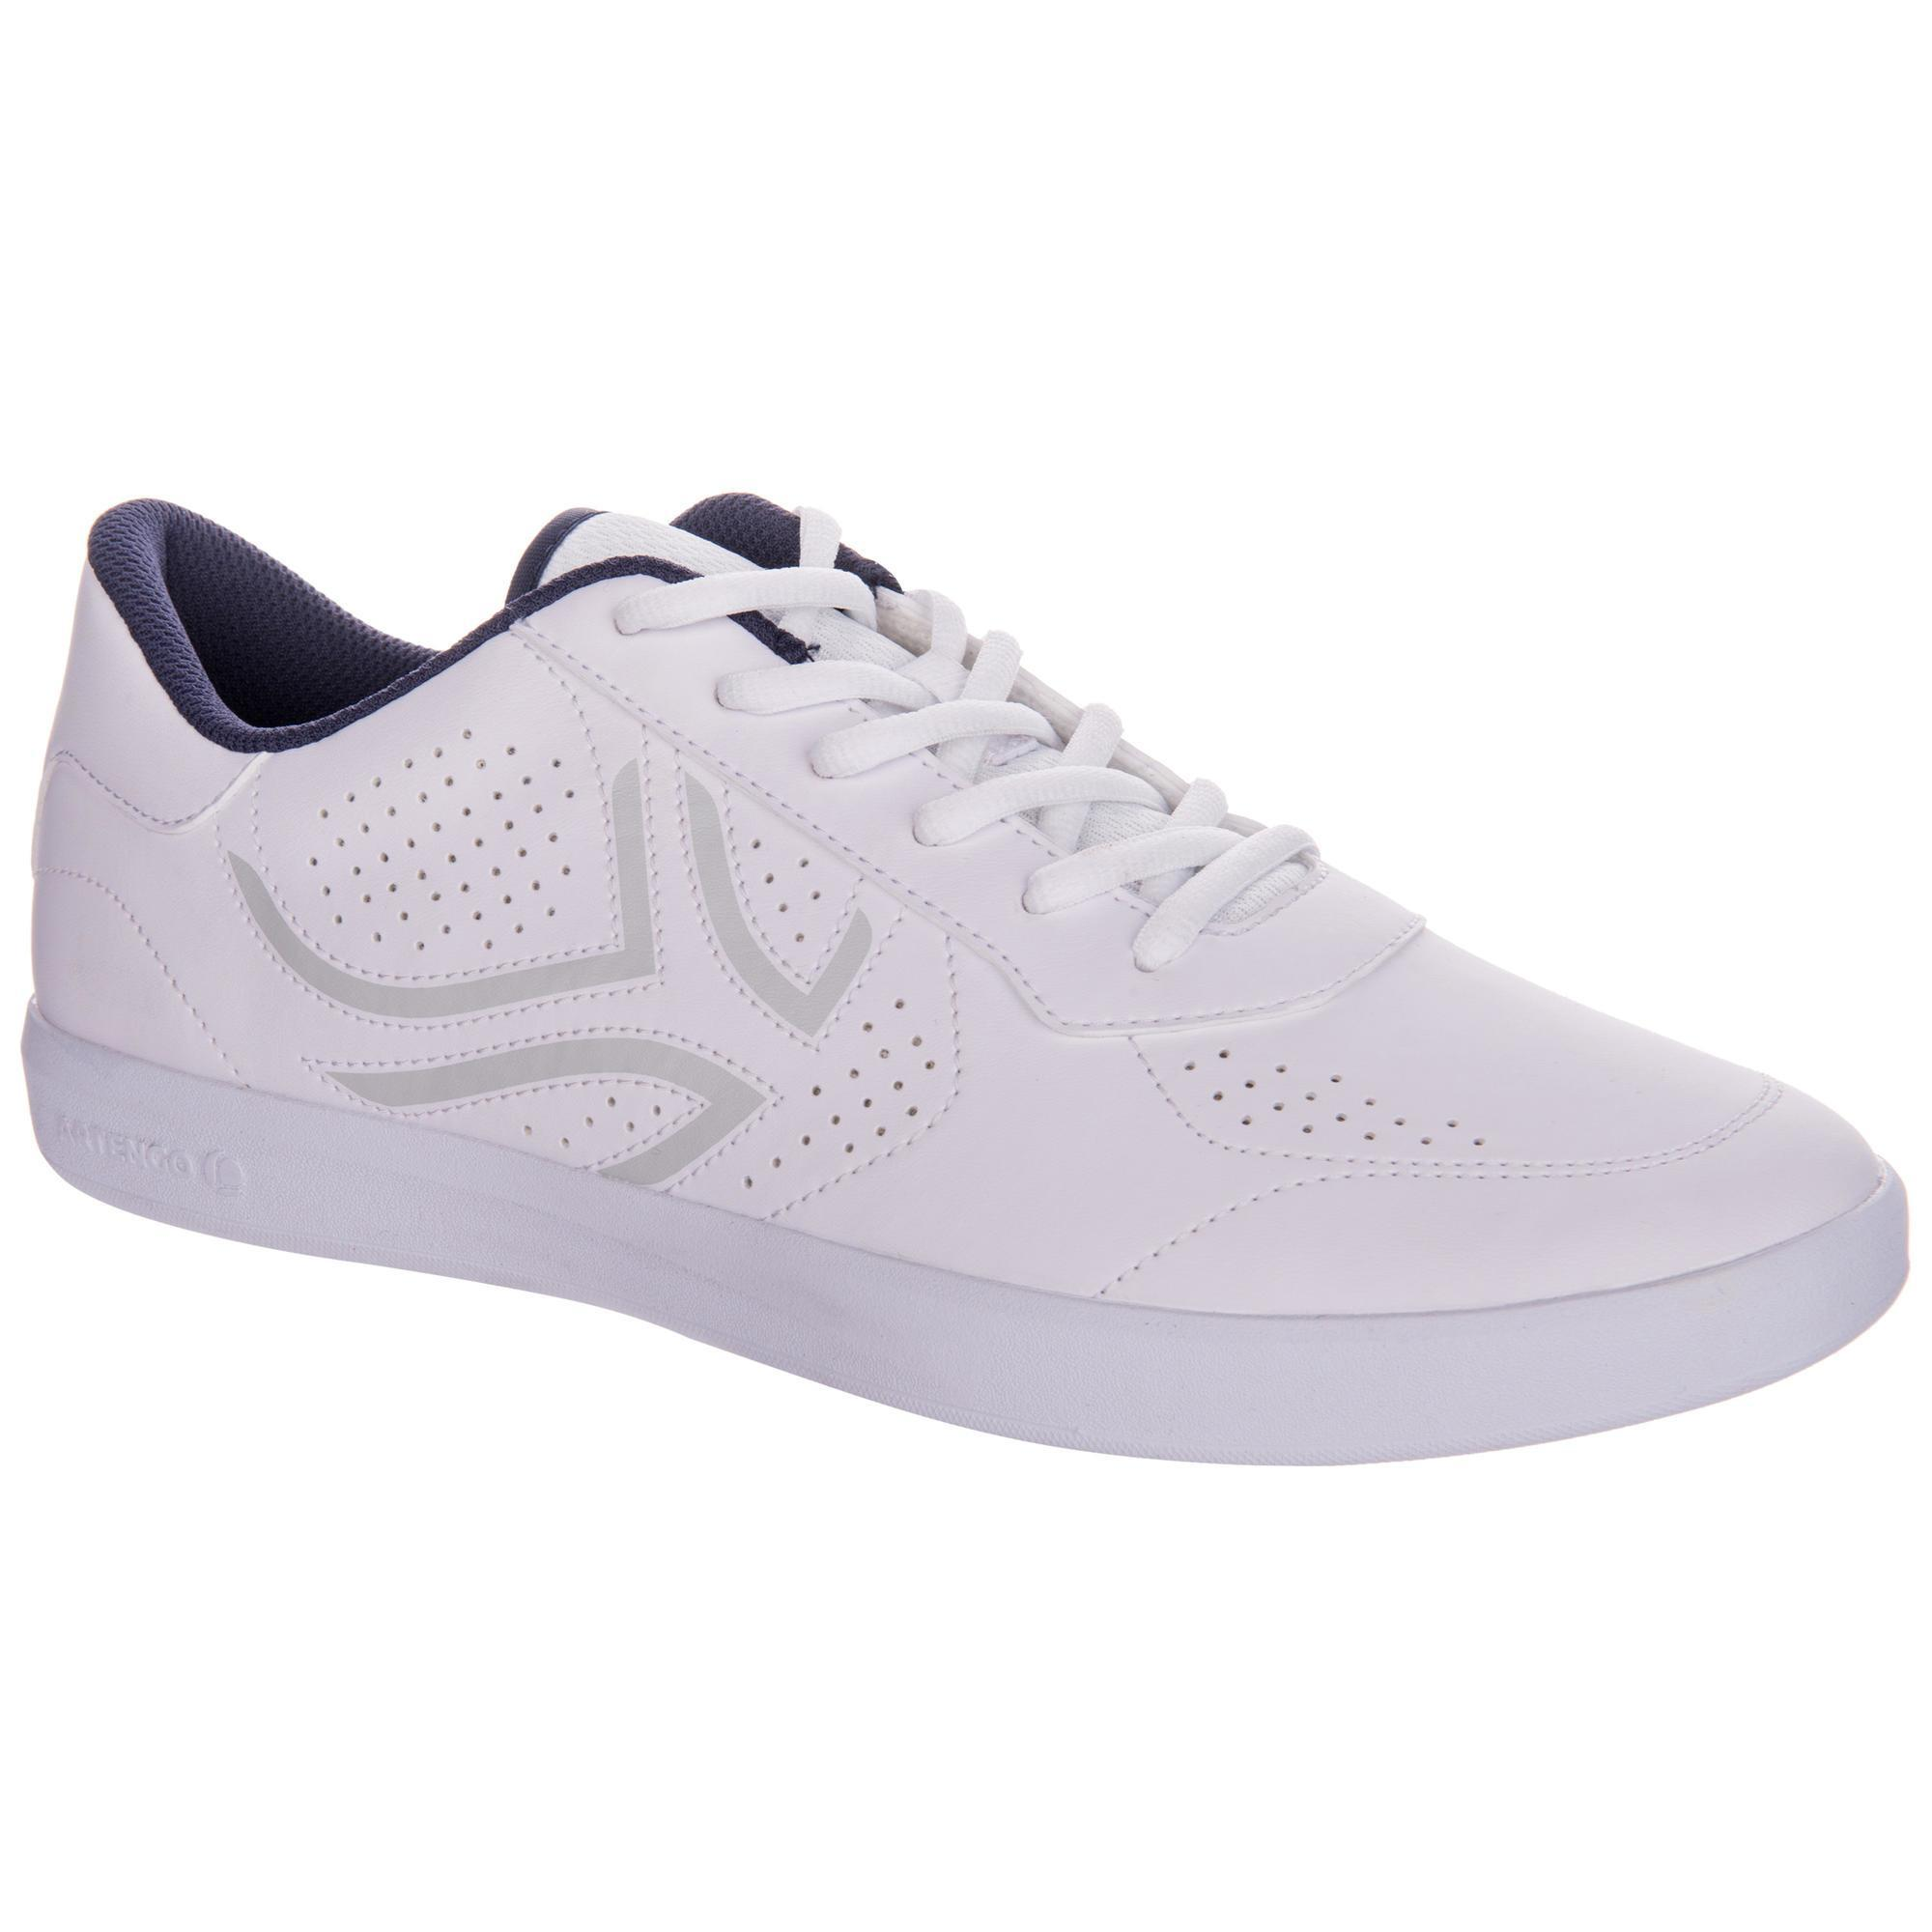 Tennisschuhe TS100 mit Schnürung Multicourt Herren weiß | Schuhe > Sportschuhe > Tennisschuhe | Weiß | Artengo